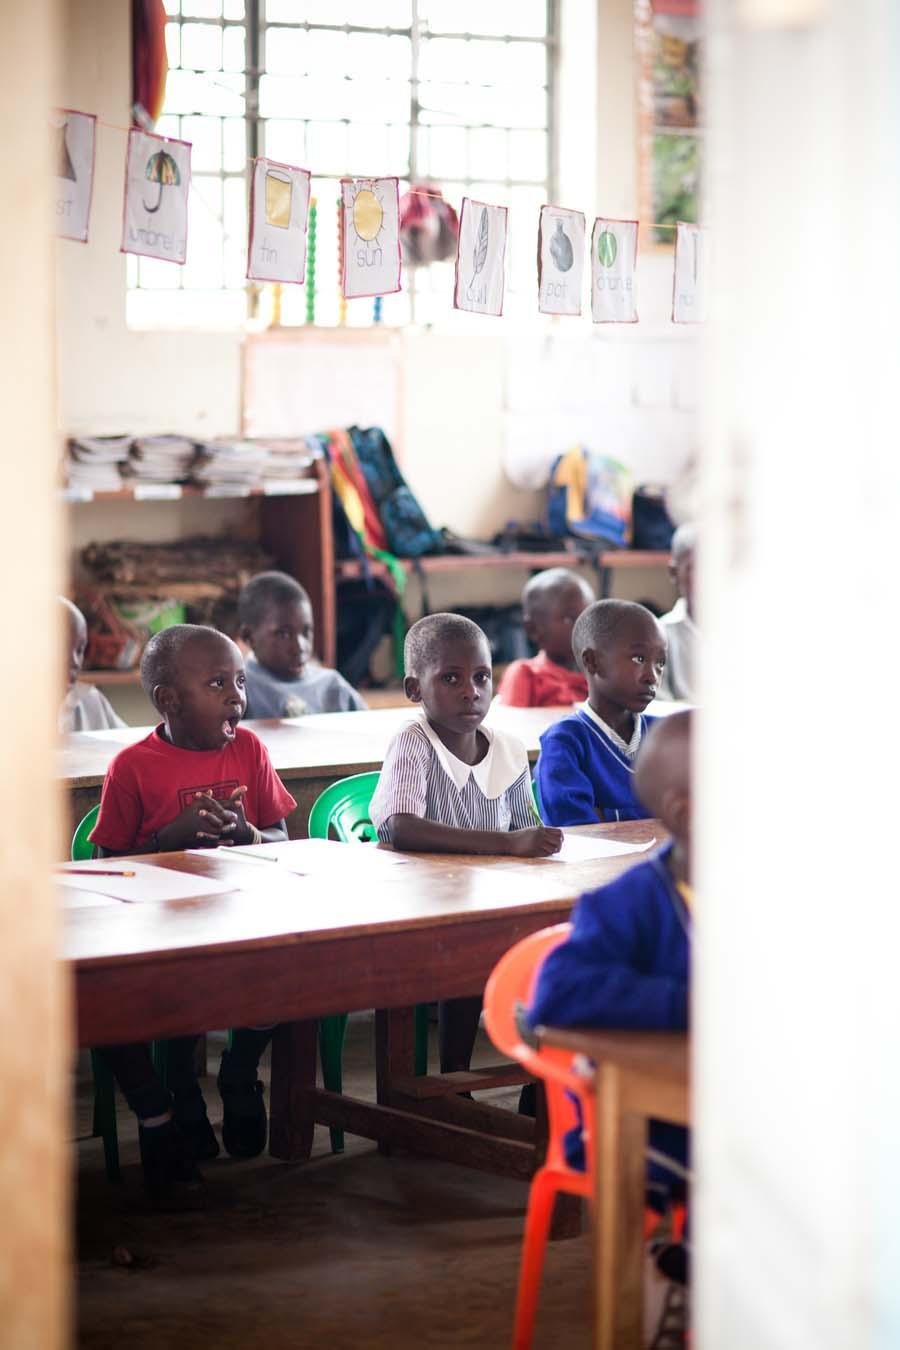 jessicadavisphotography.com | Jessica Davis Photography | Portrait Work in Uganda| Travel Photographer | World Event Photographs 9 (5).jpg